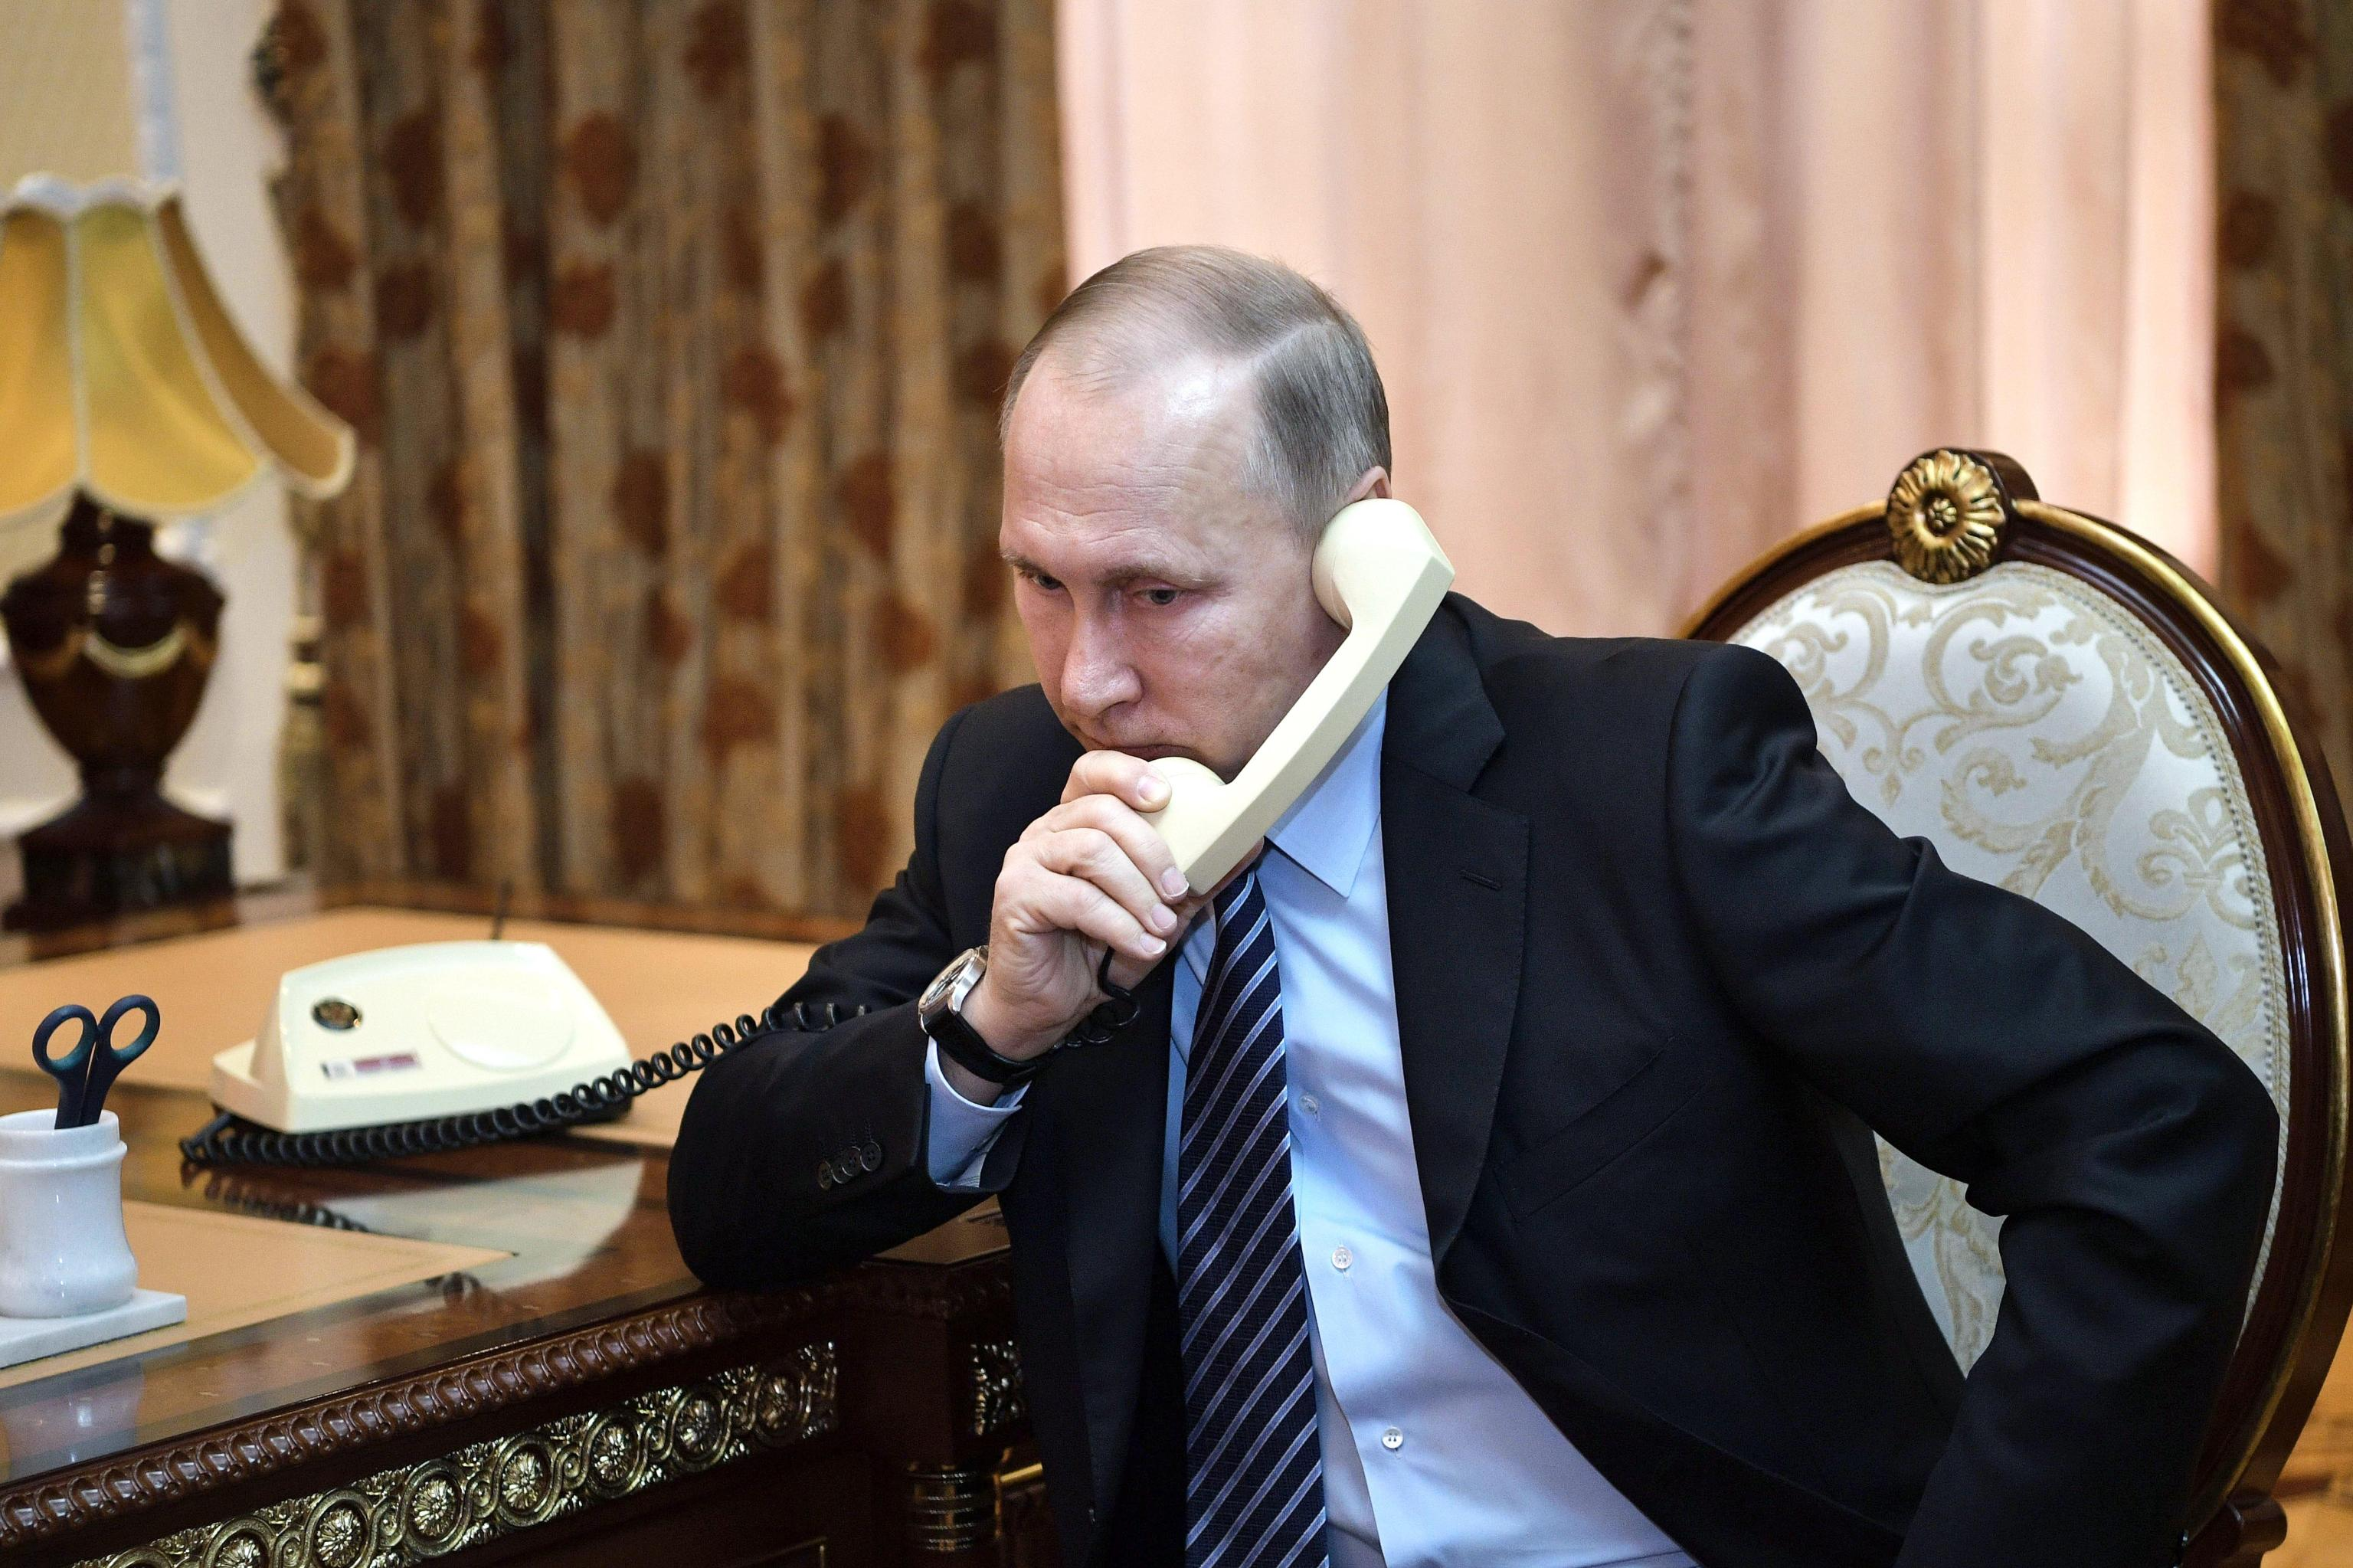 'Cia ha sventato attacchi S.Pietroburgo'